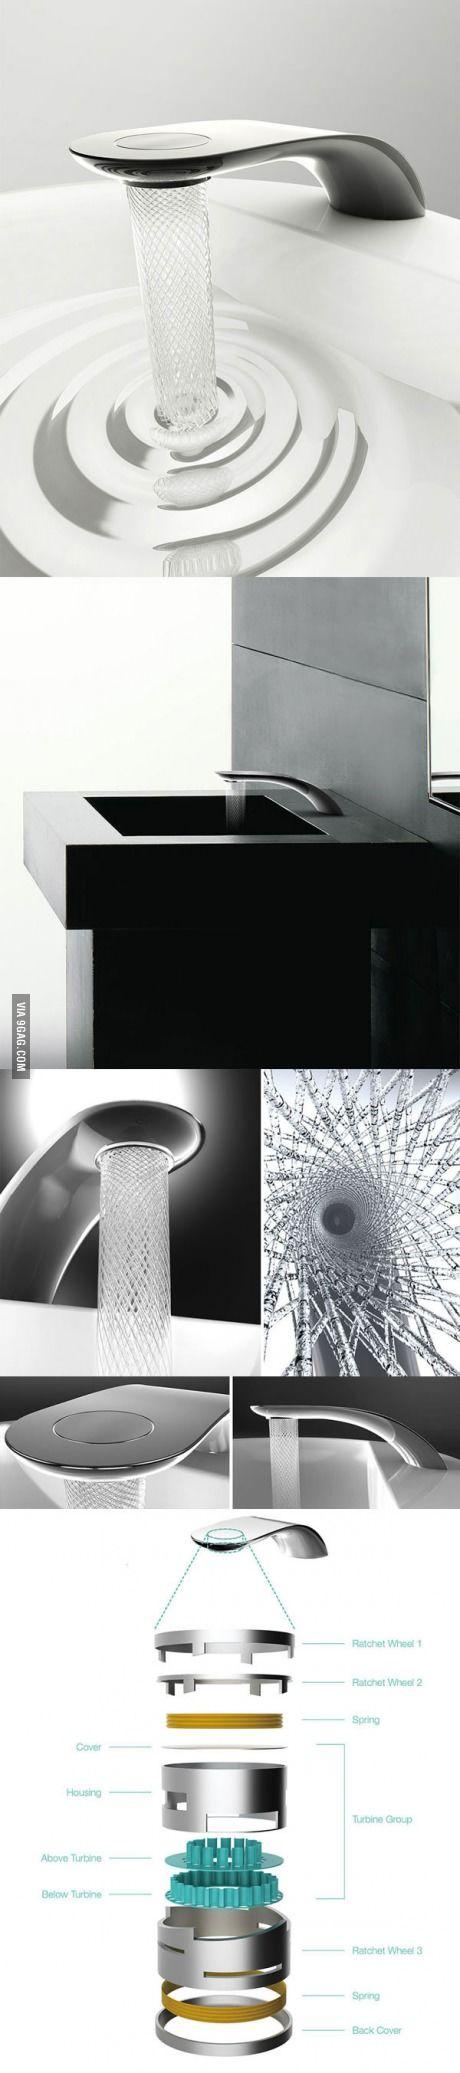 Water Armony